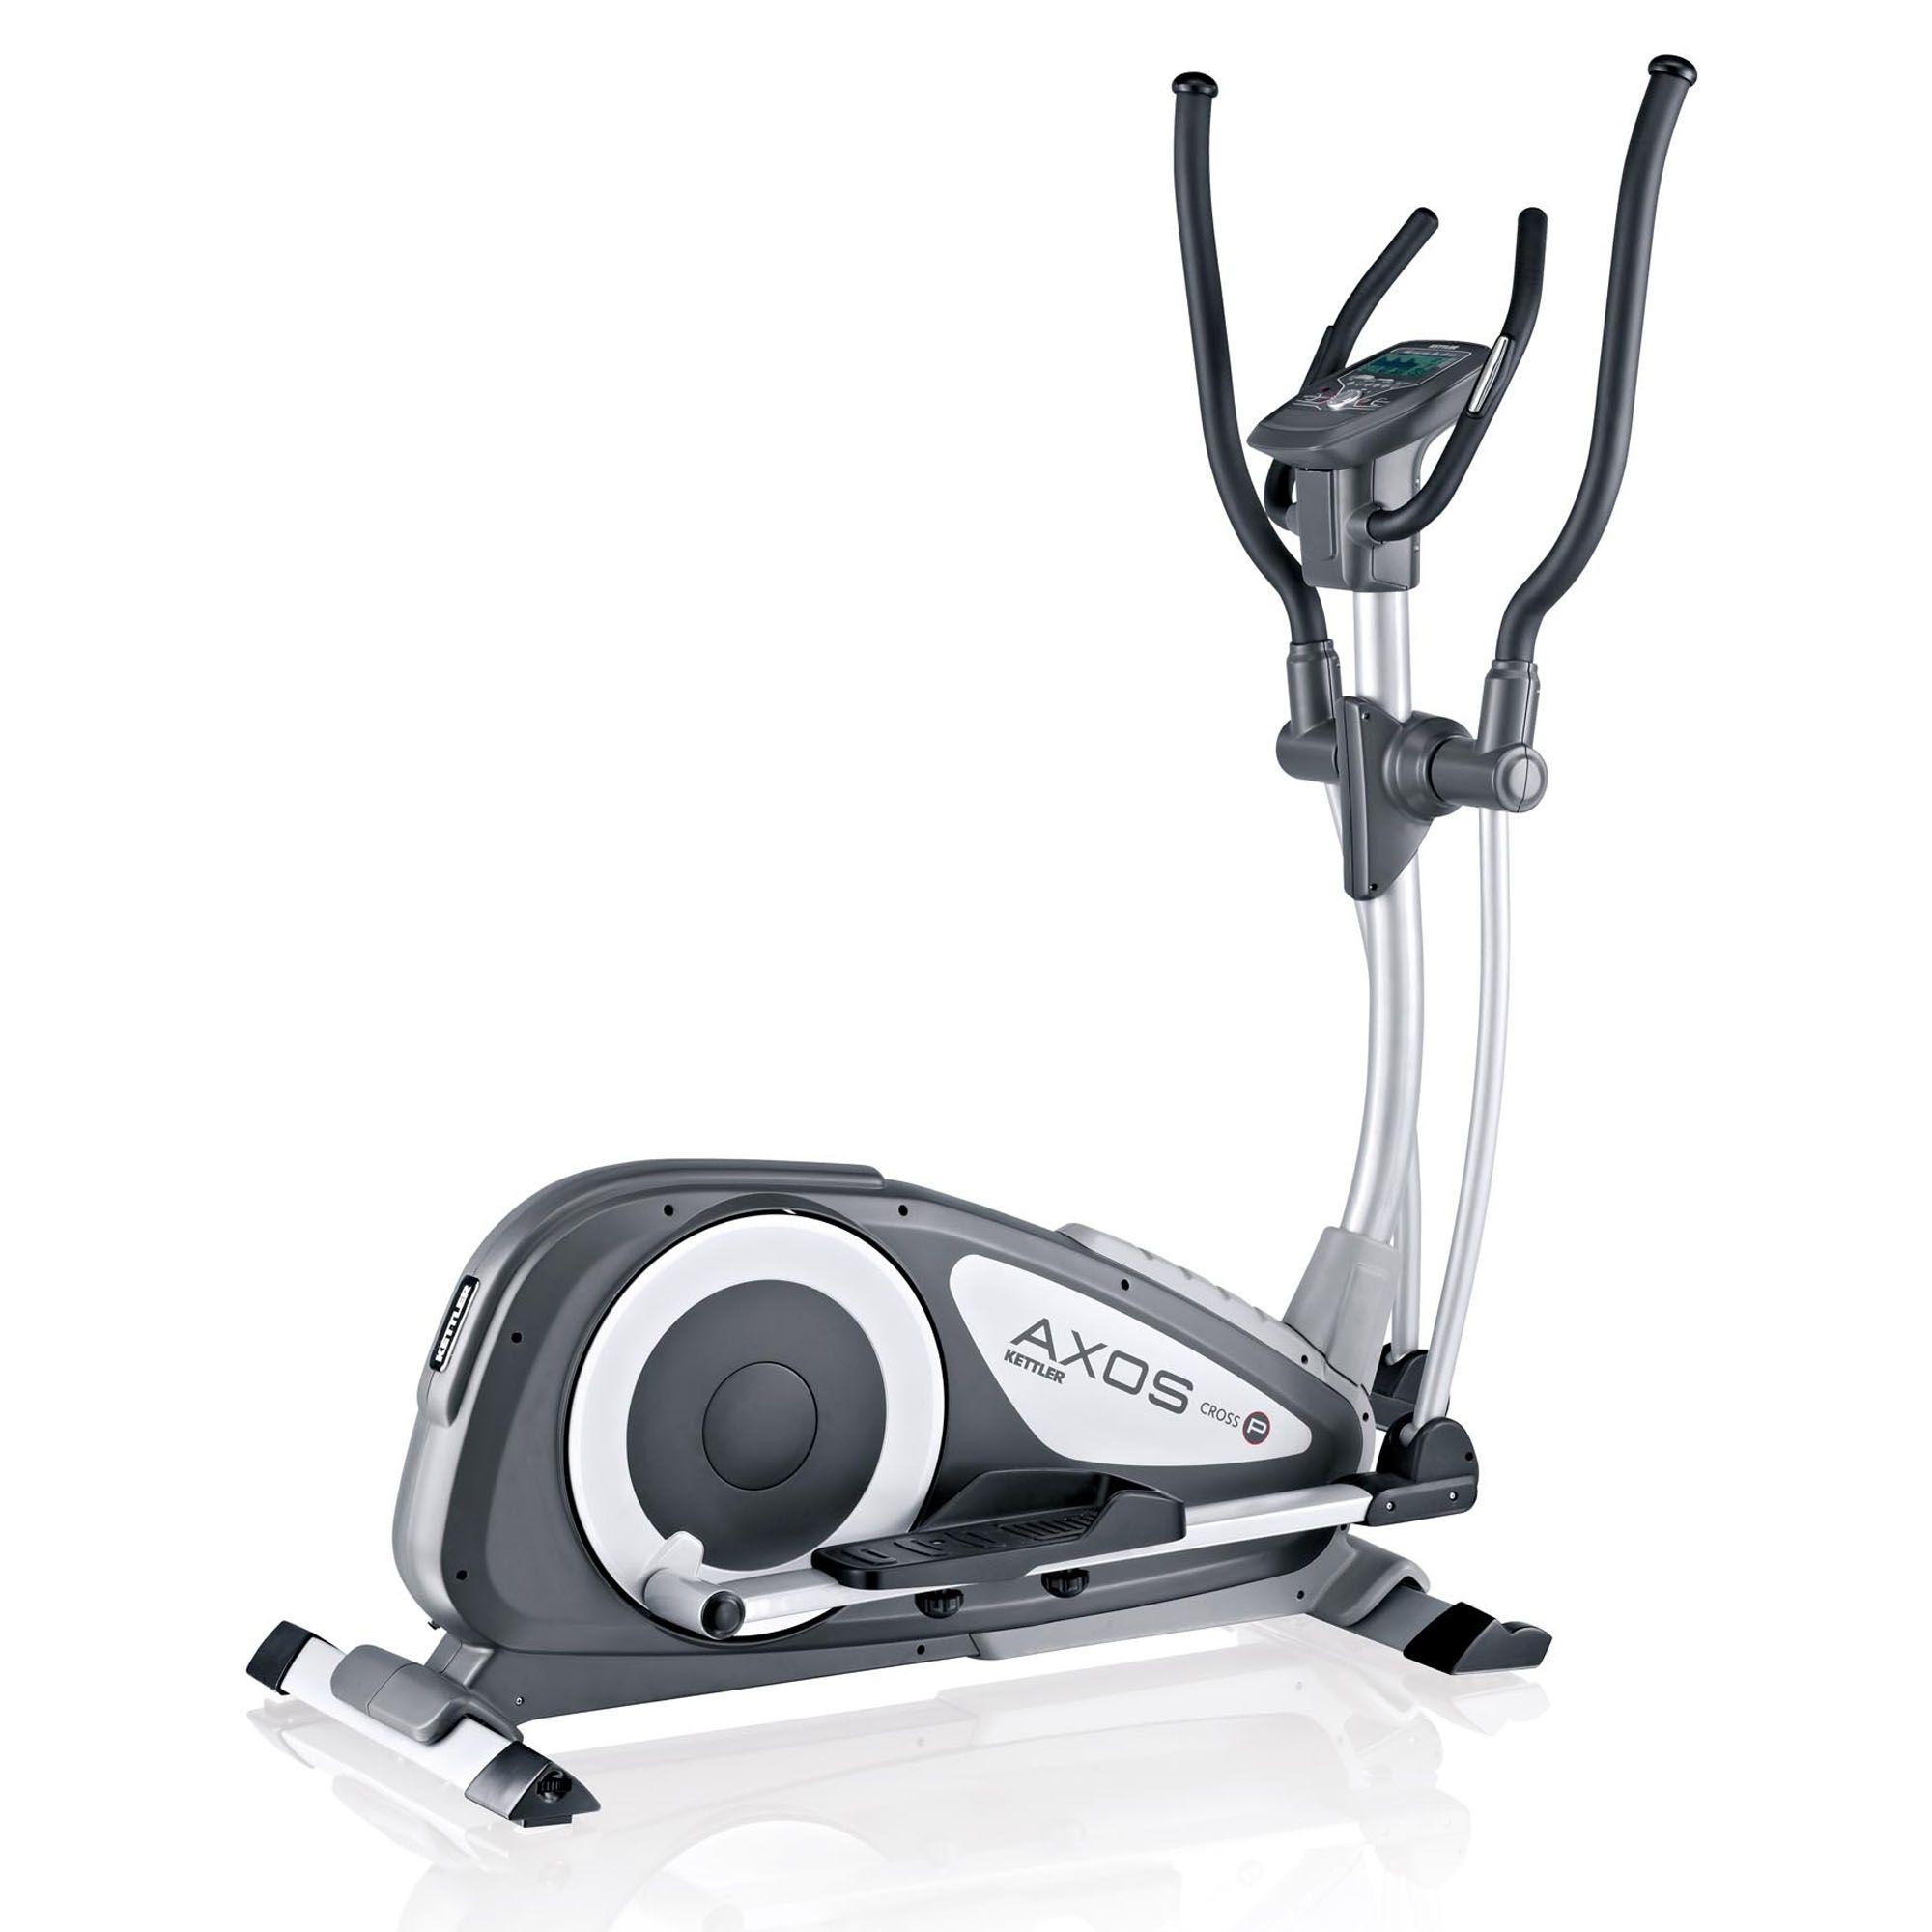 kettler cross p elliptical cross trainer. Black Bedroom Furniture Sets. Home Design Ideas